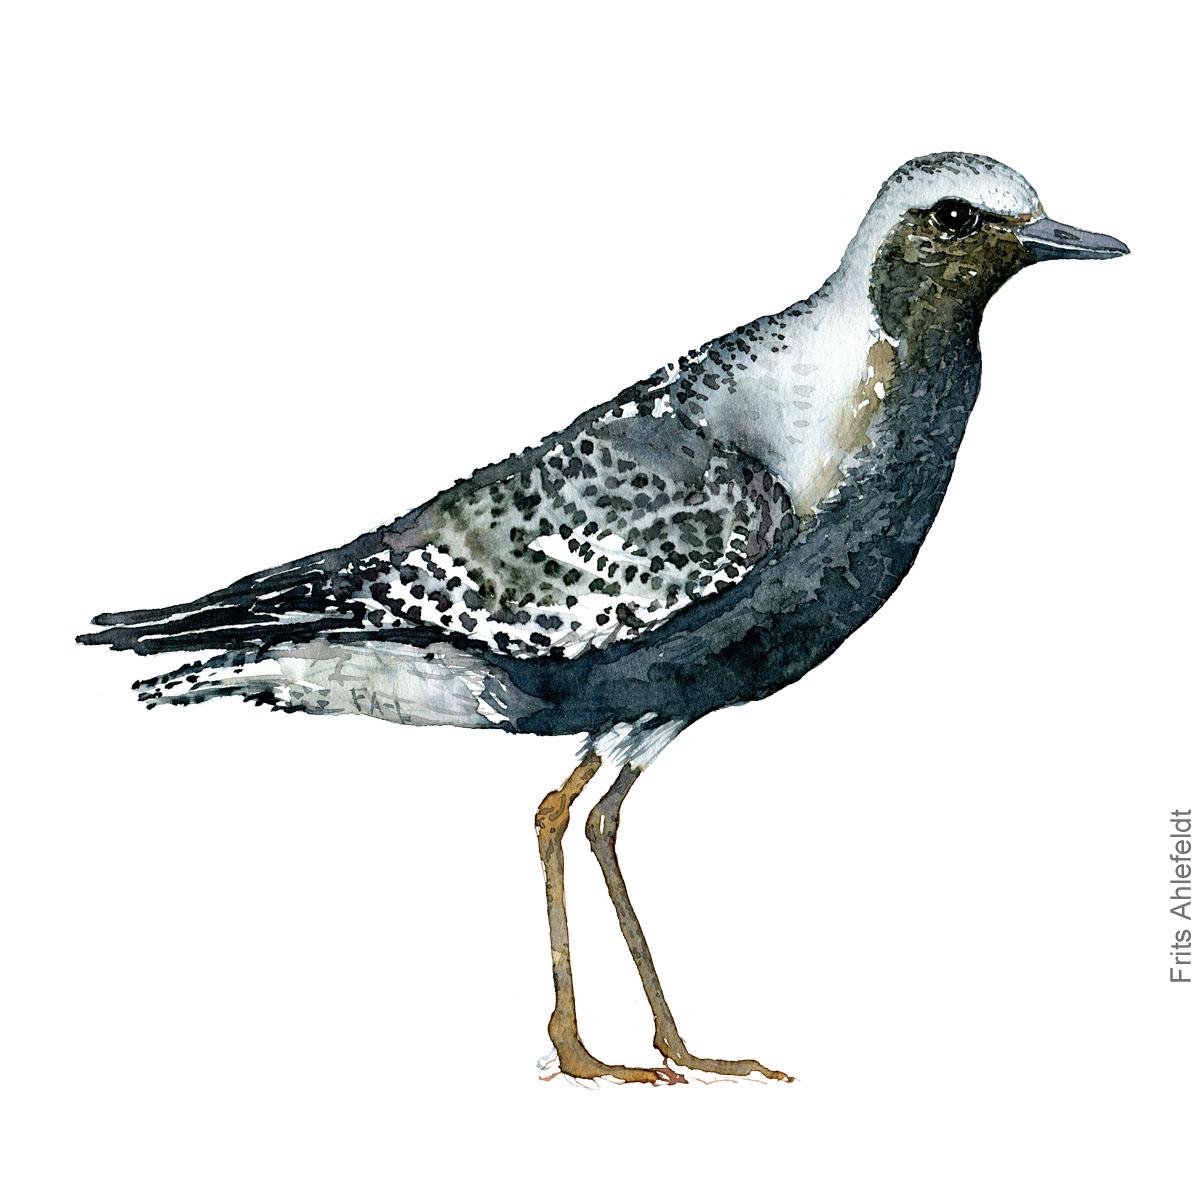 Strandhjejle - Grey plover bird watercolor painting. Artwork by Frits Ahlefeldt. Fugle akvarel